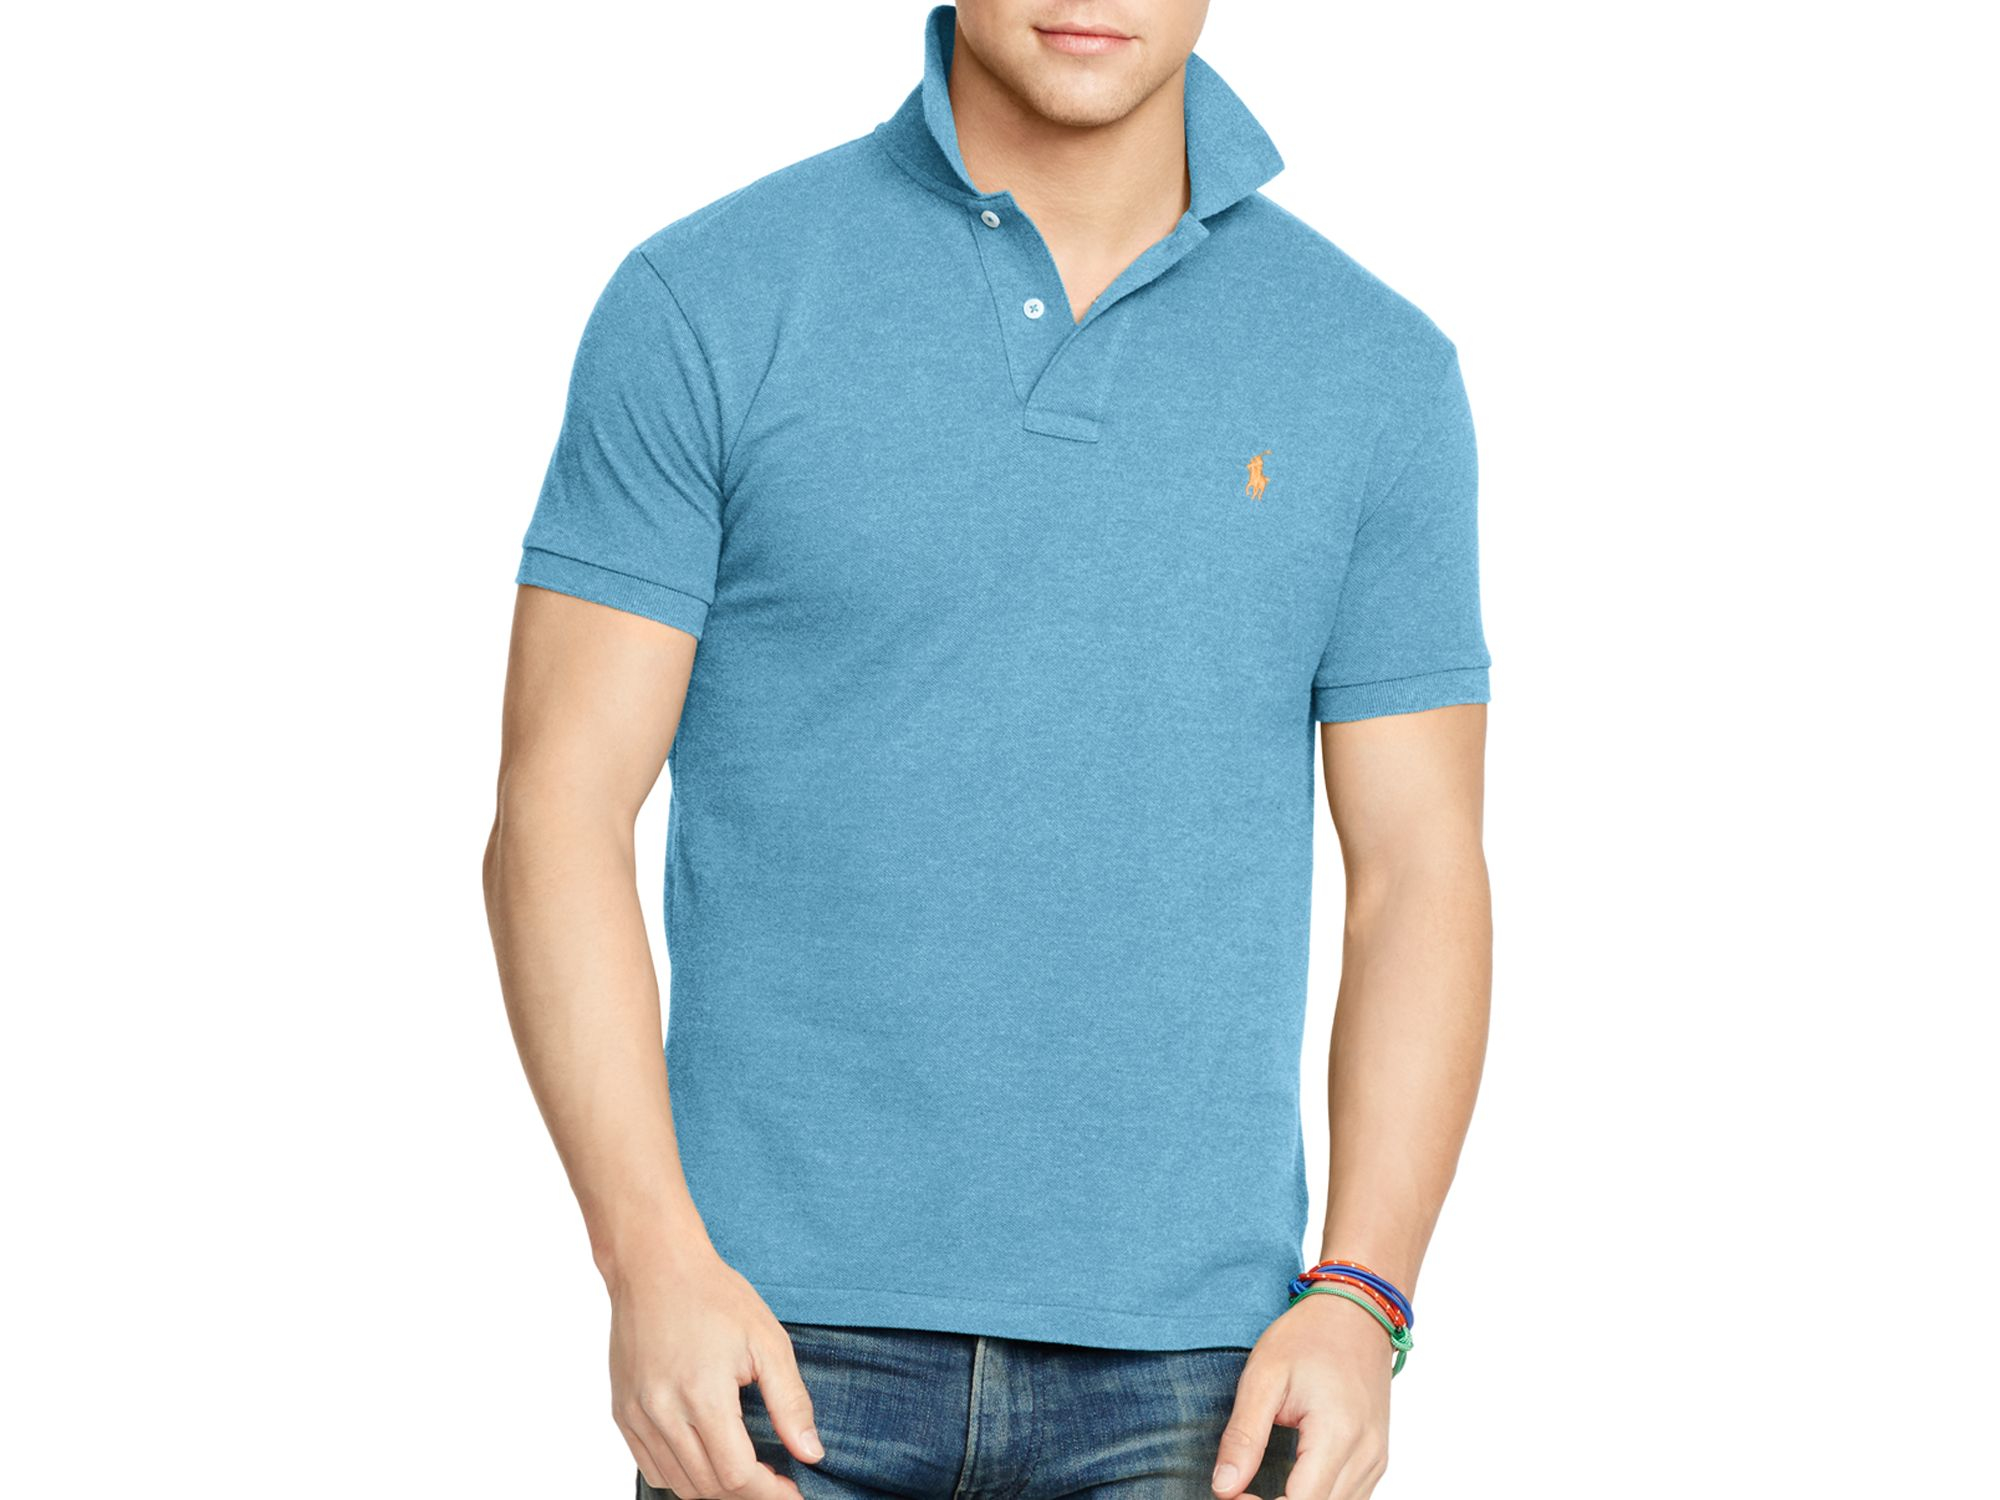 e989cf01 ... clearance lyst polo ralph lauren slim fit mesh polo shirt in blue for  men b4991 2e5ed